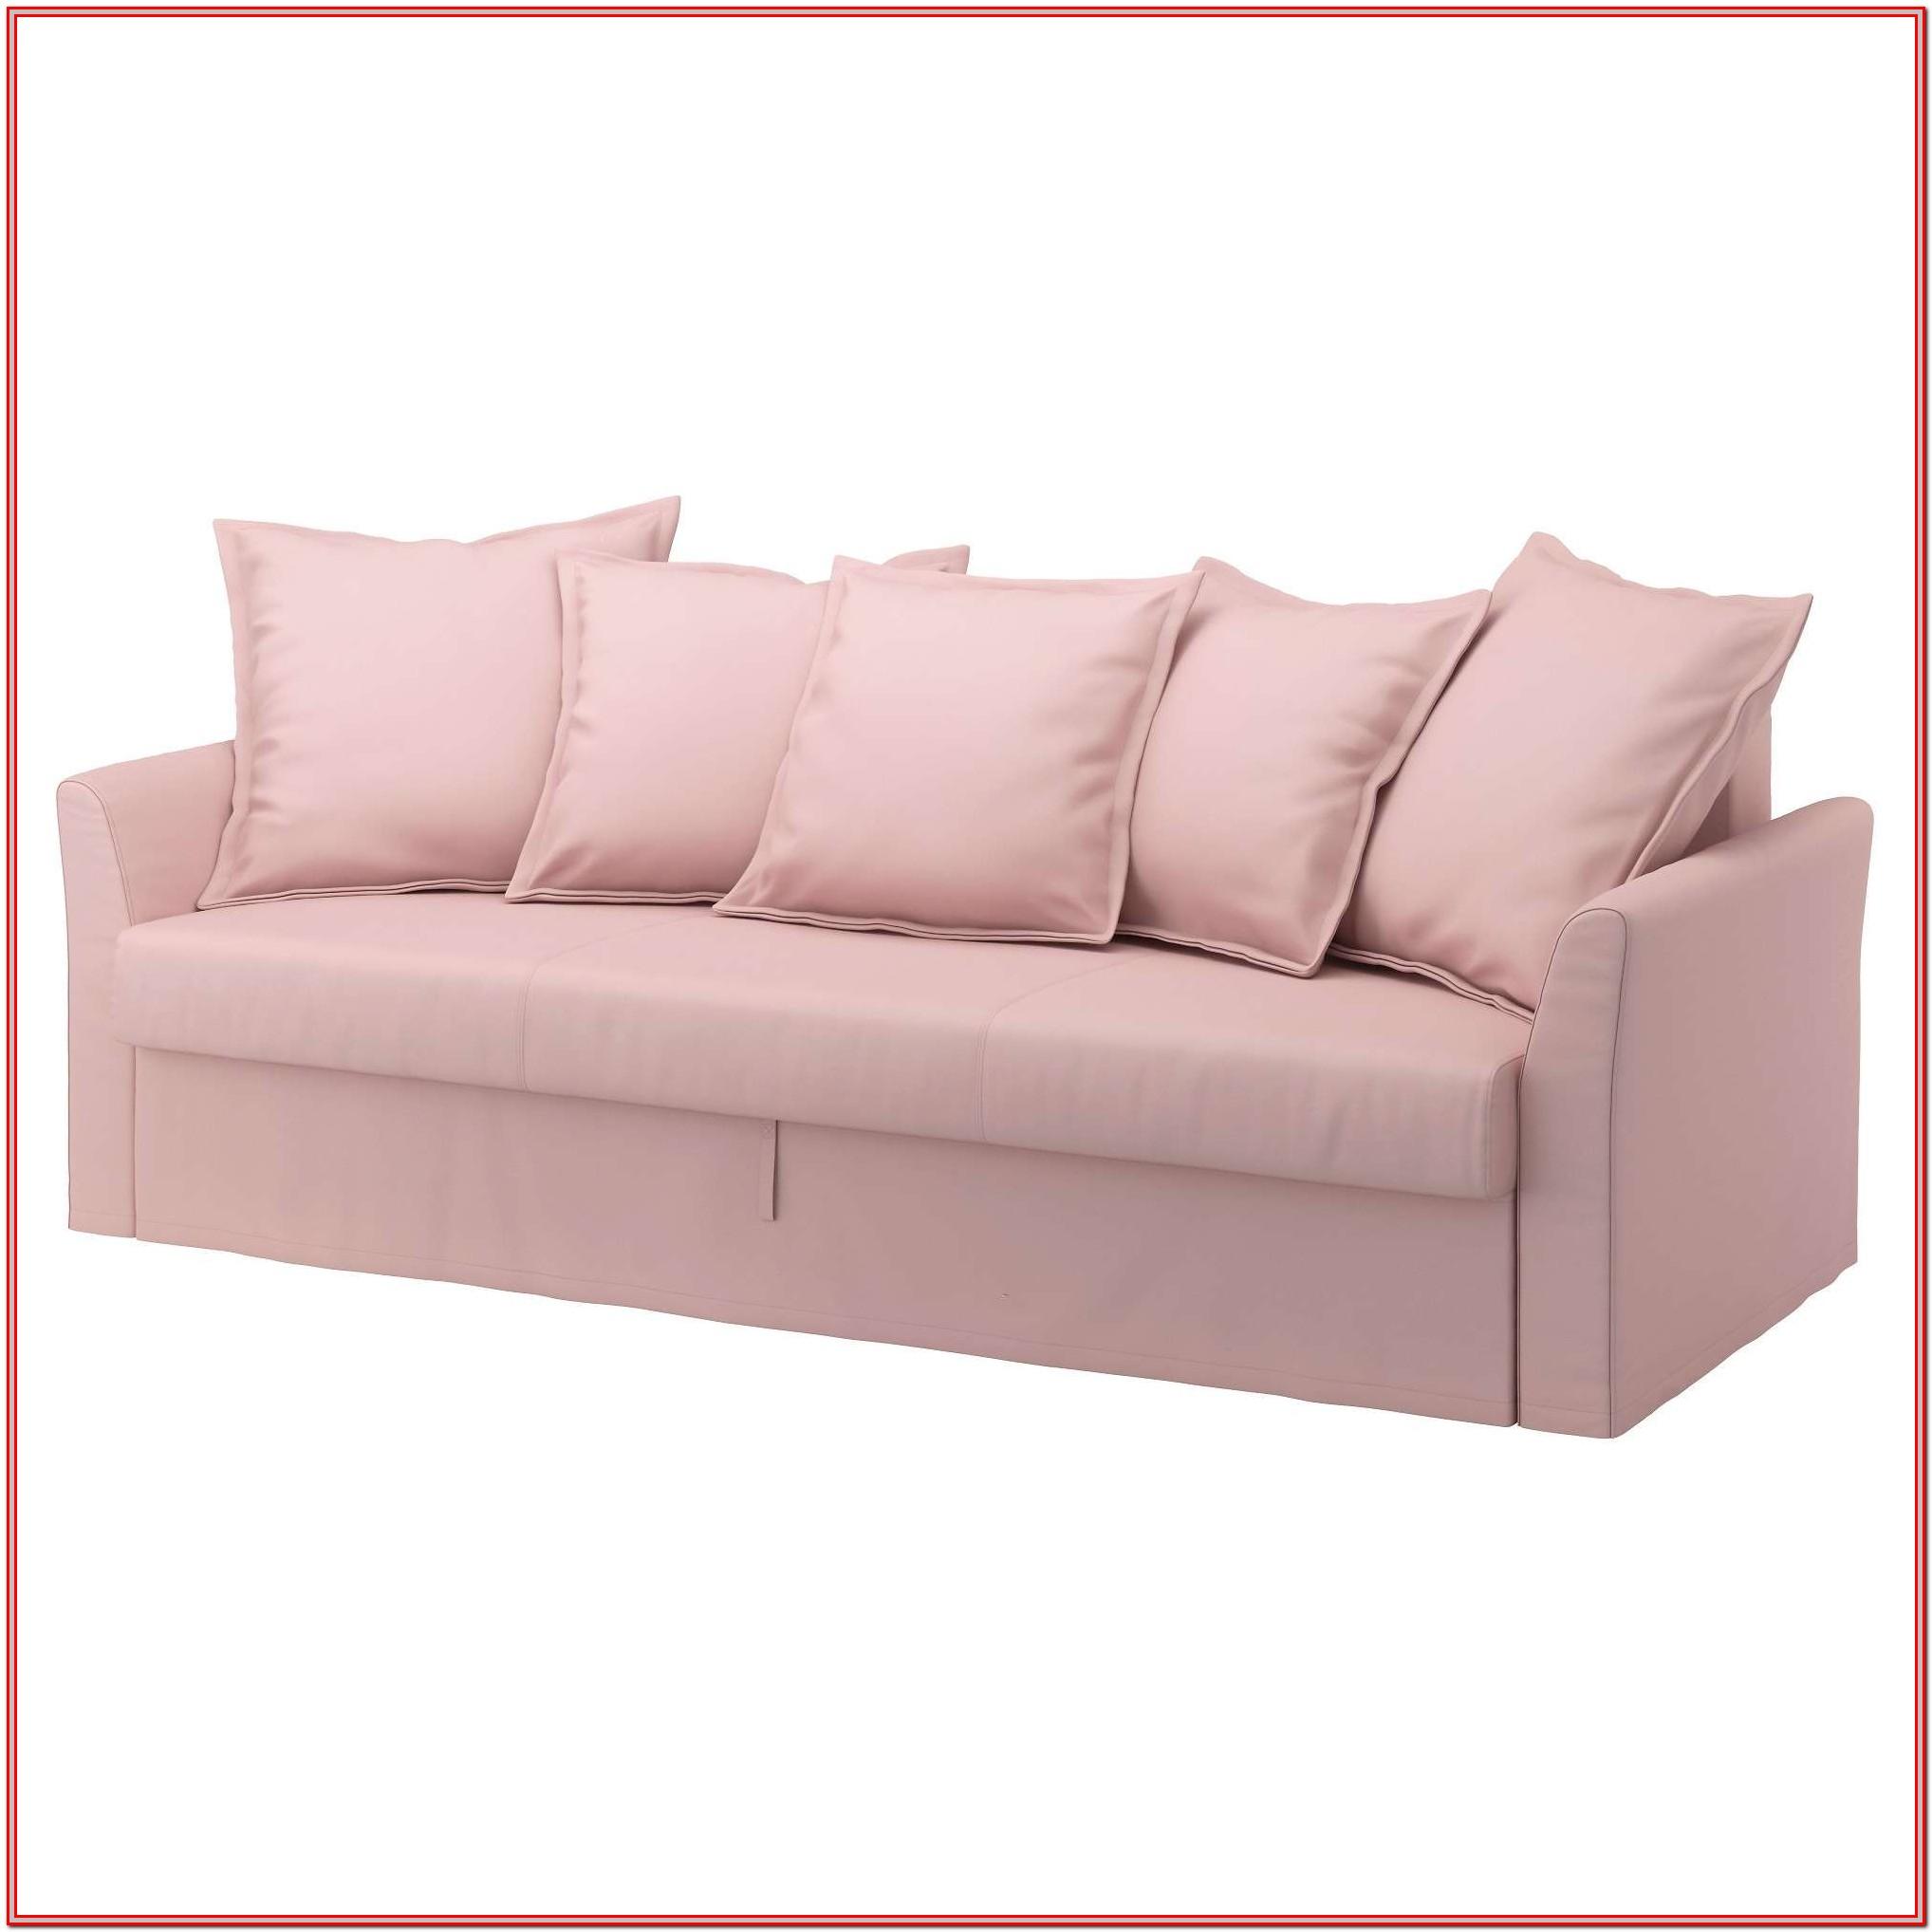 Ikea L Shaped Sofa Bed Instructions